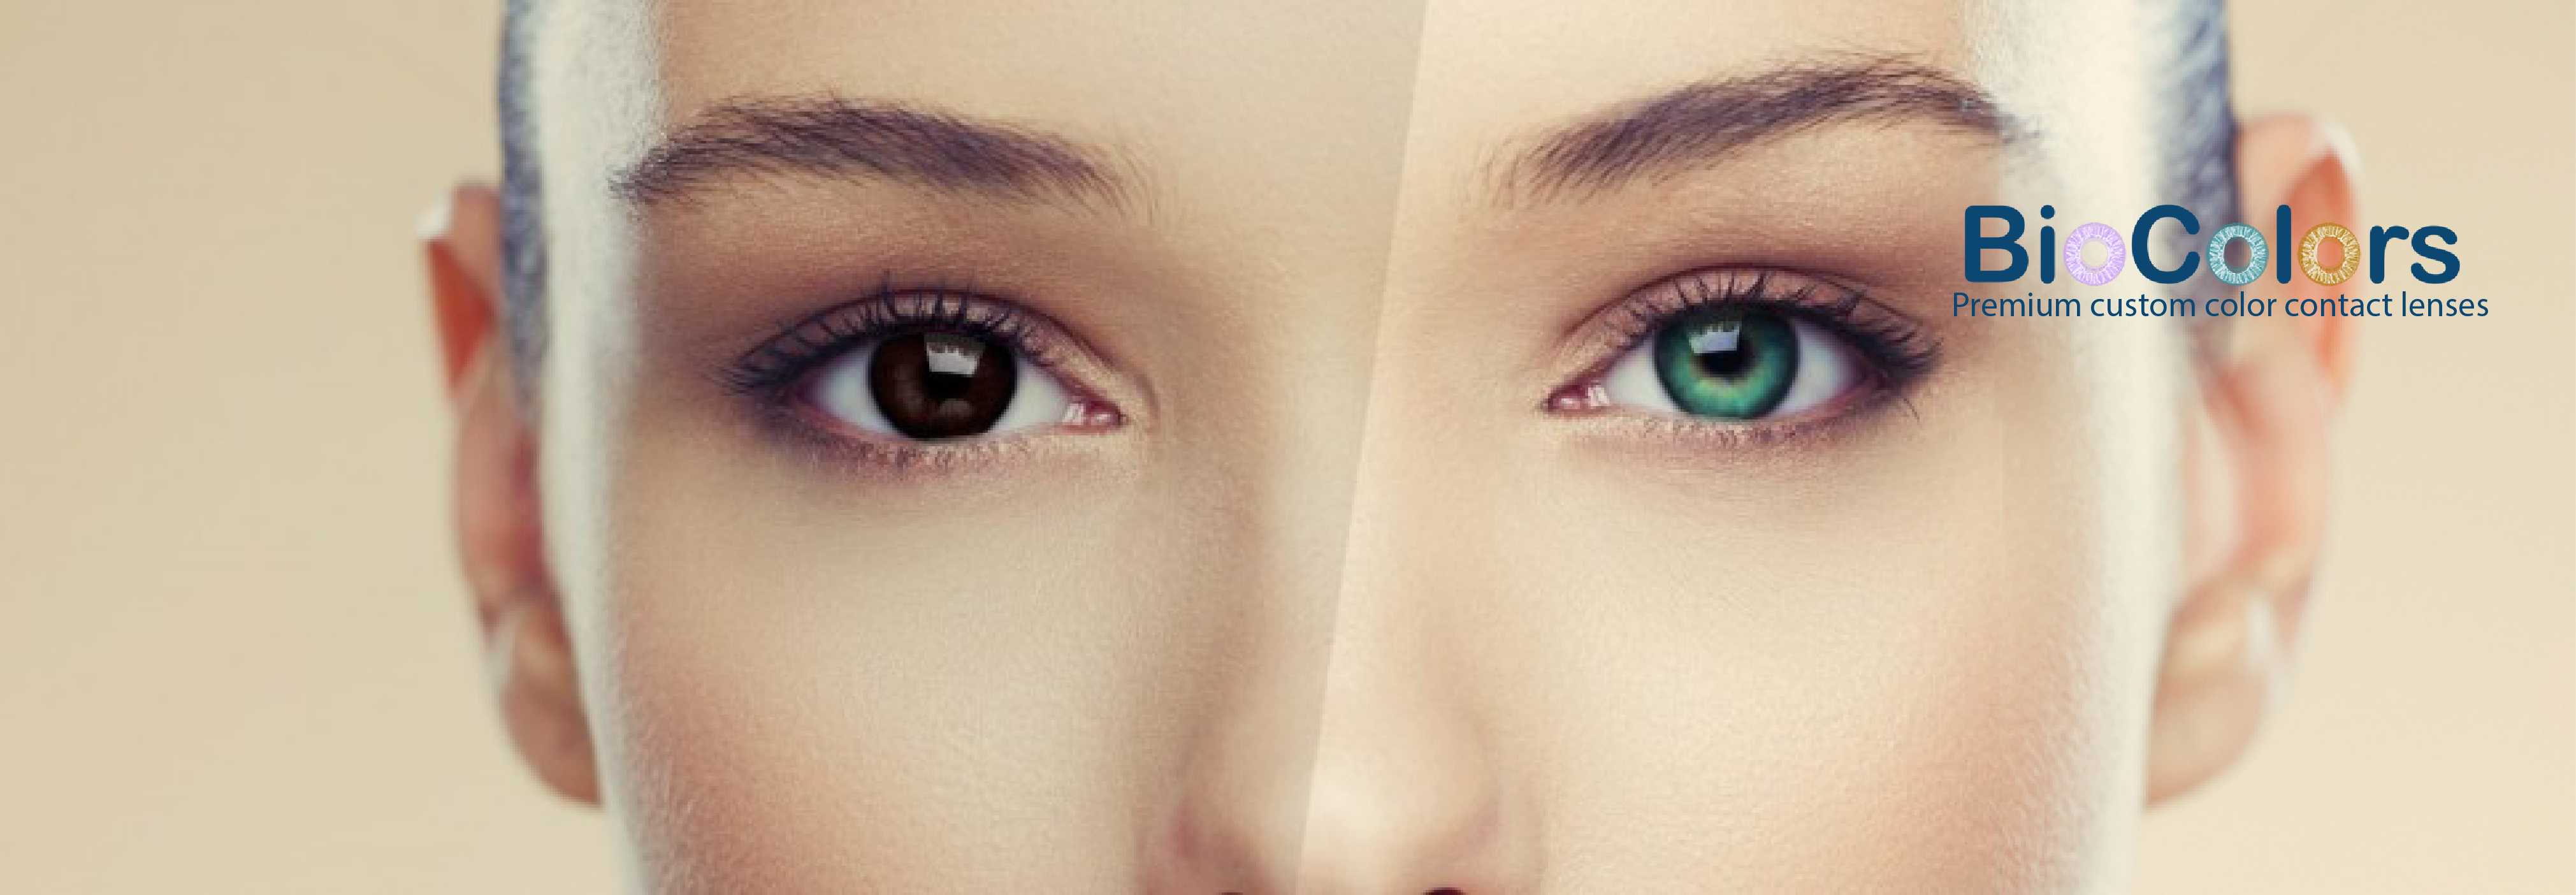 Orion vision group custom contact lenses nvjuhfo Choice Image